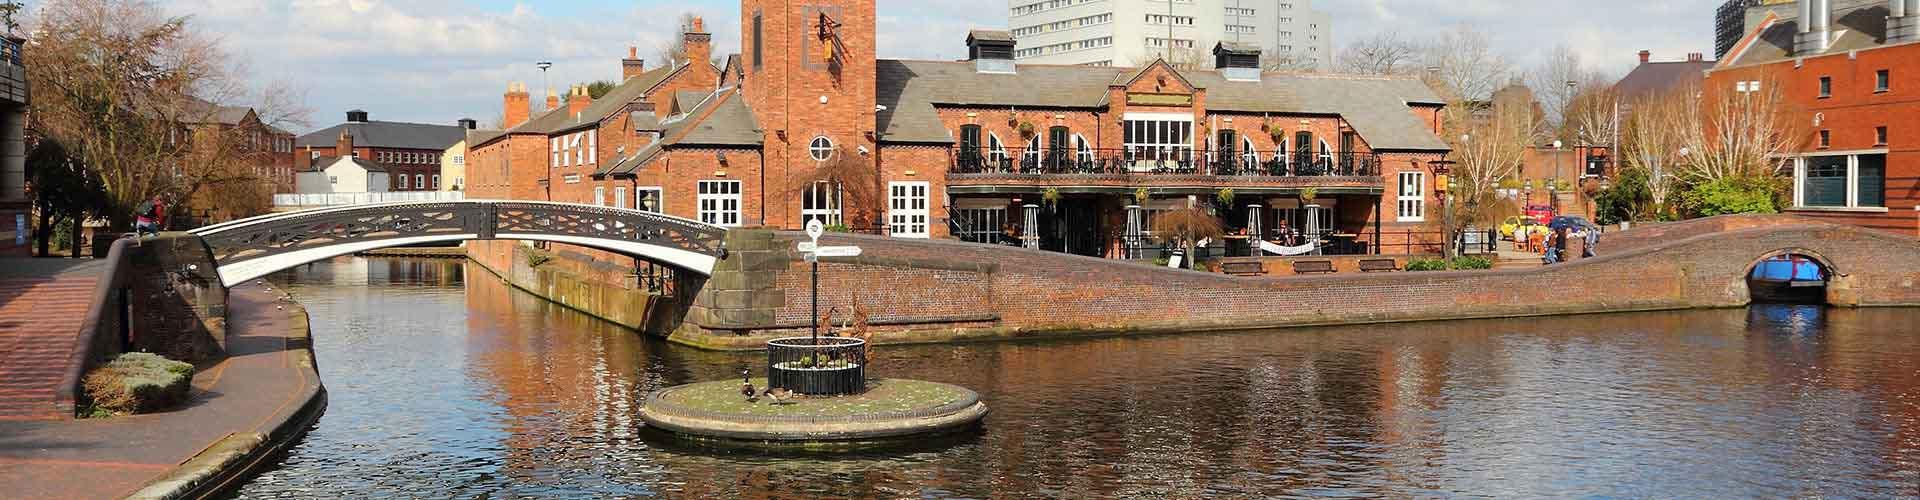 Birmingham - Hostelů v Birmingham. Mapy pro Birmingham, fotky a recenze pro každý hostel v Birmingham.